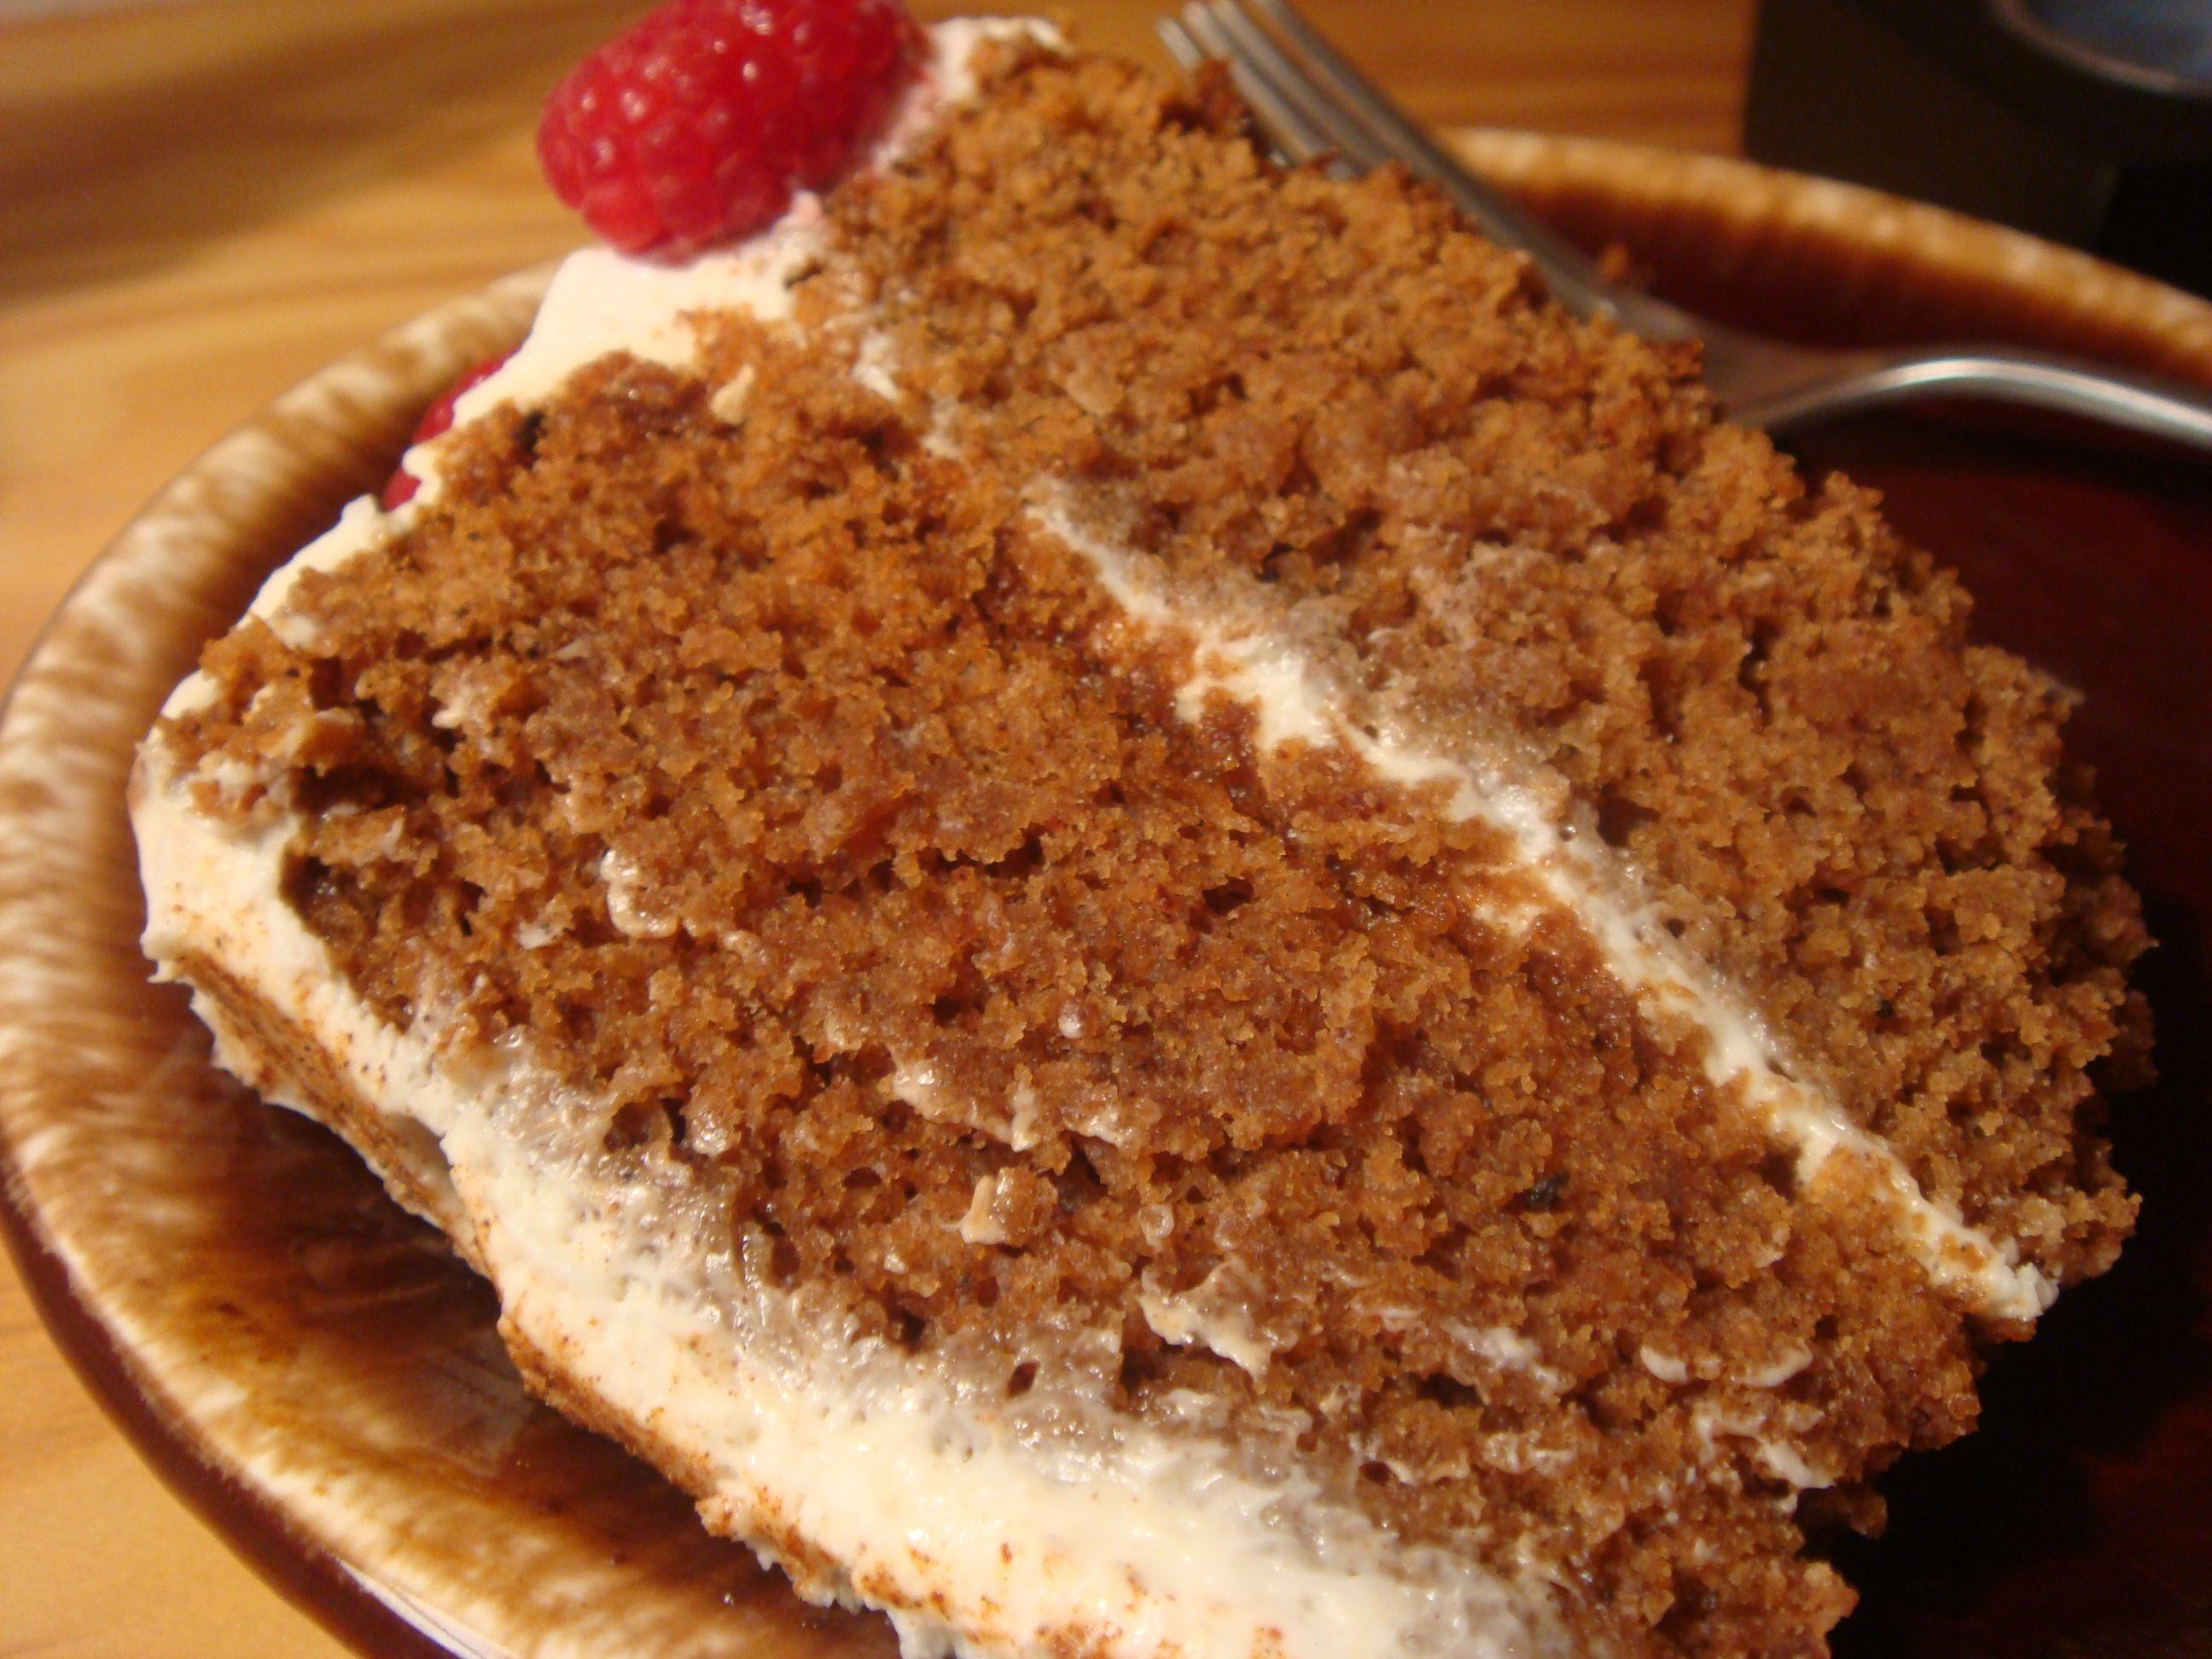 Spice cake mix recipe with applesauce